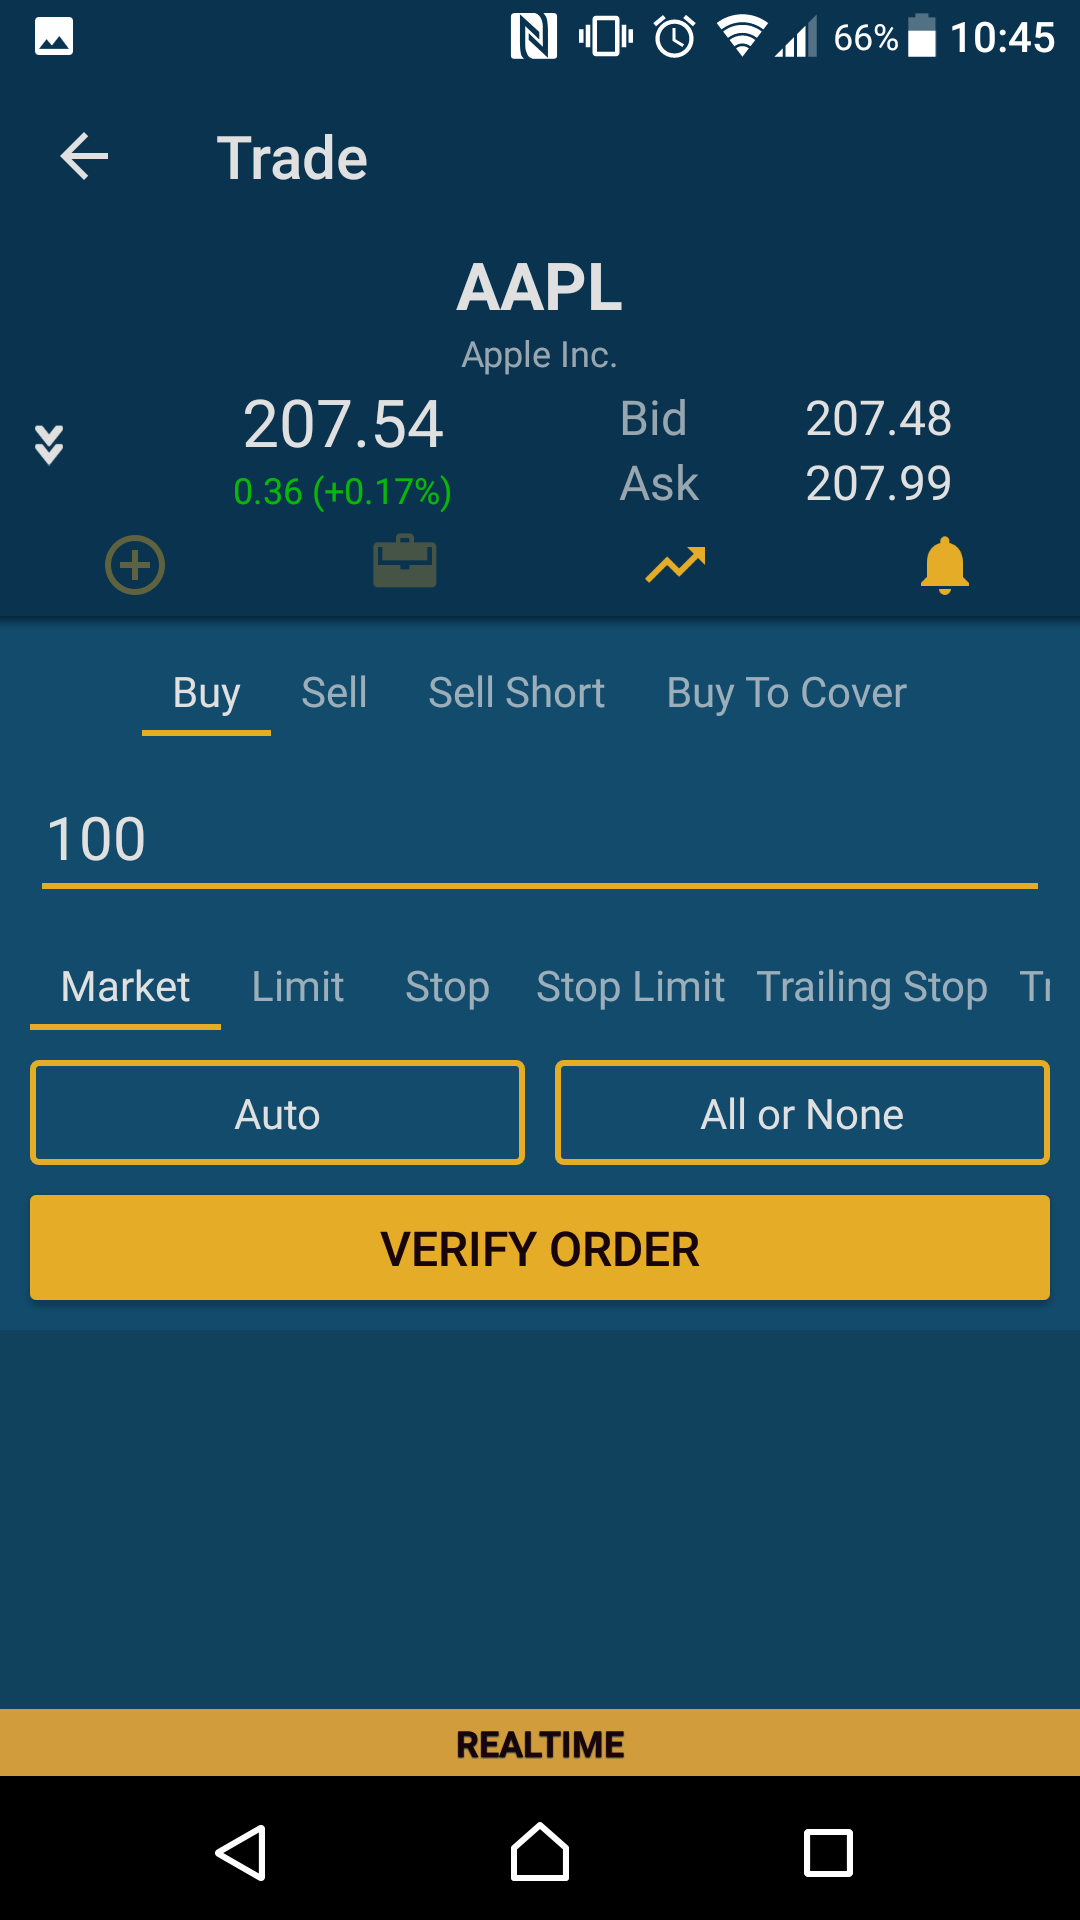 SogoTrade review - Mobile trading platform - Order panel